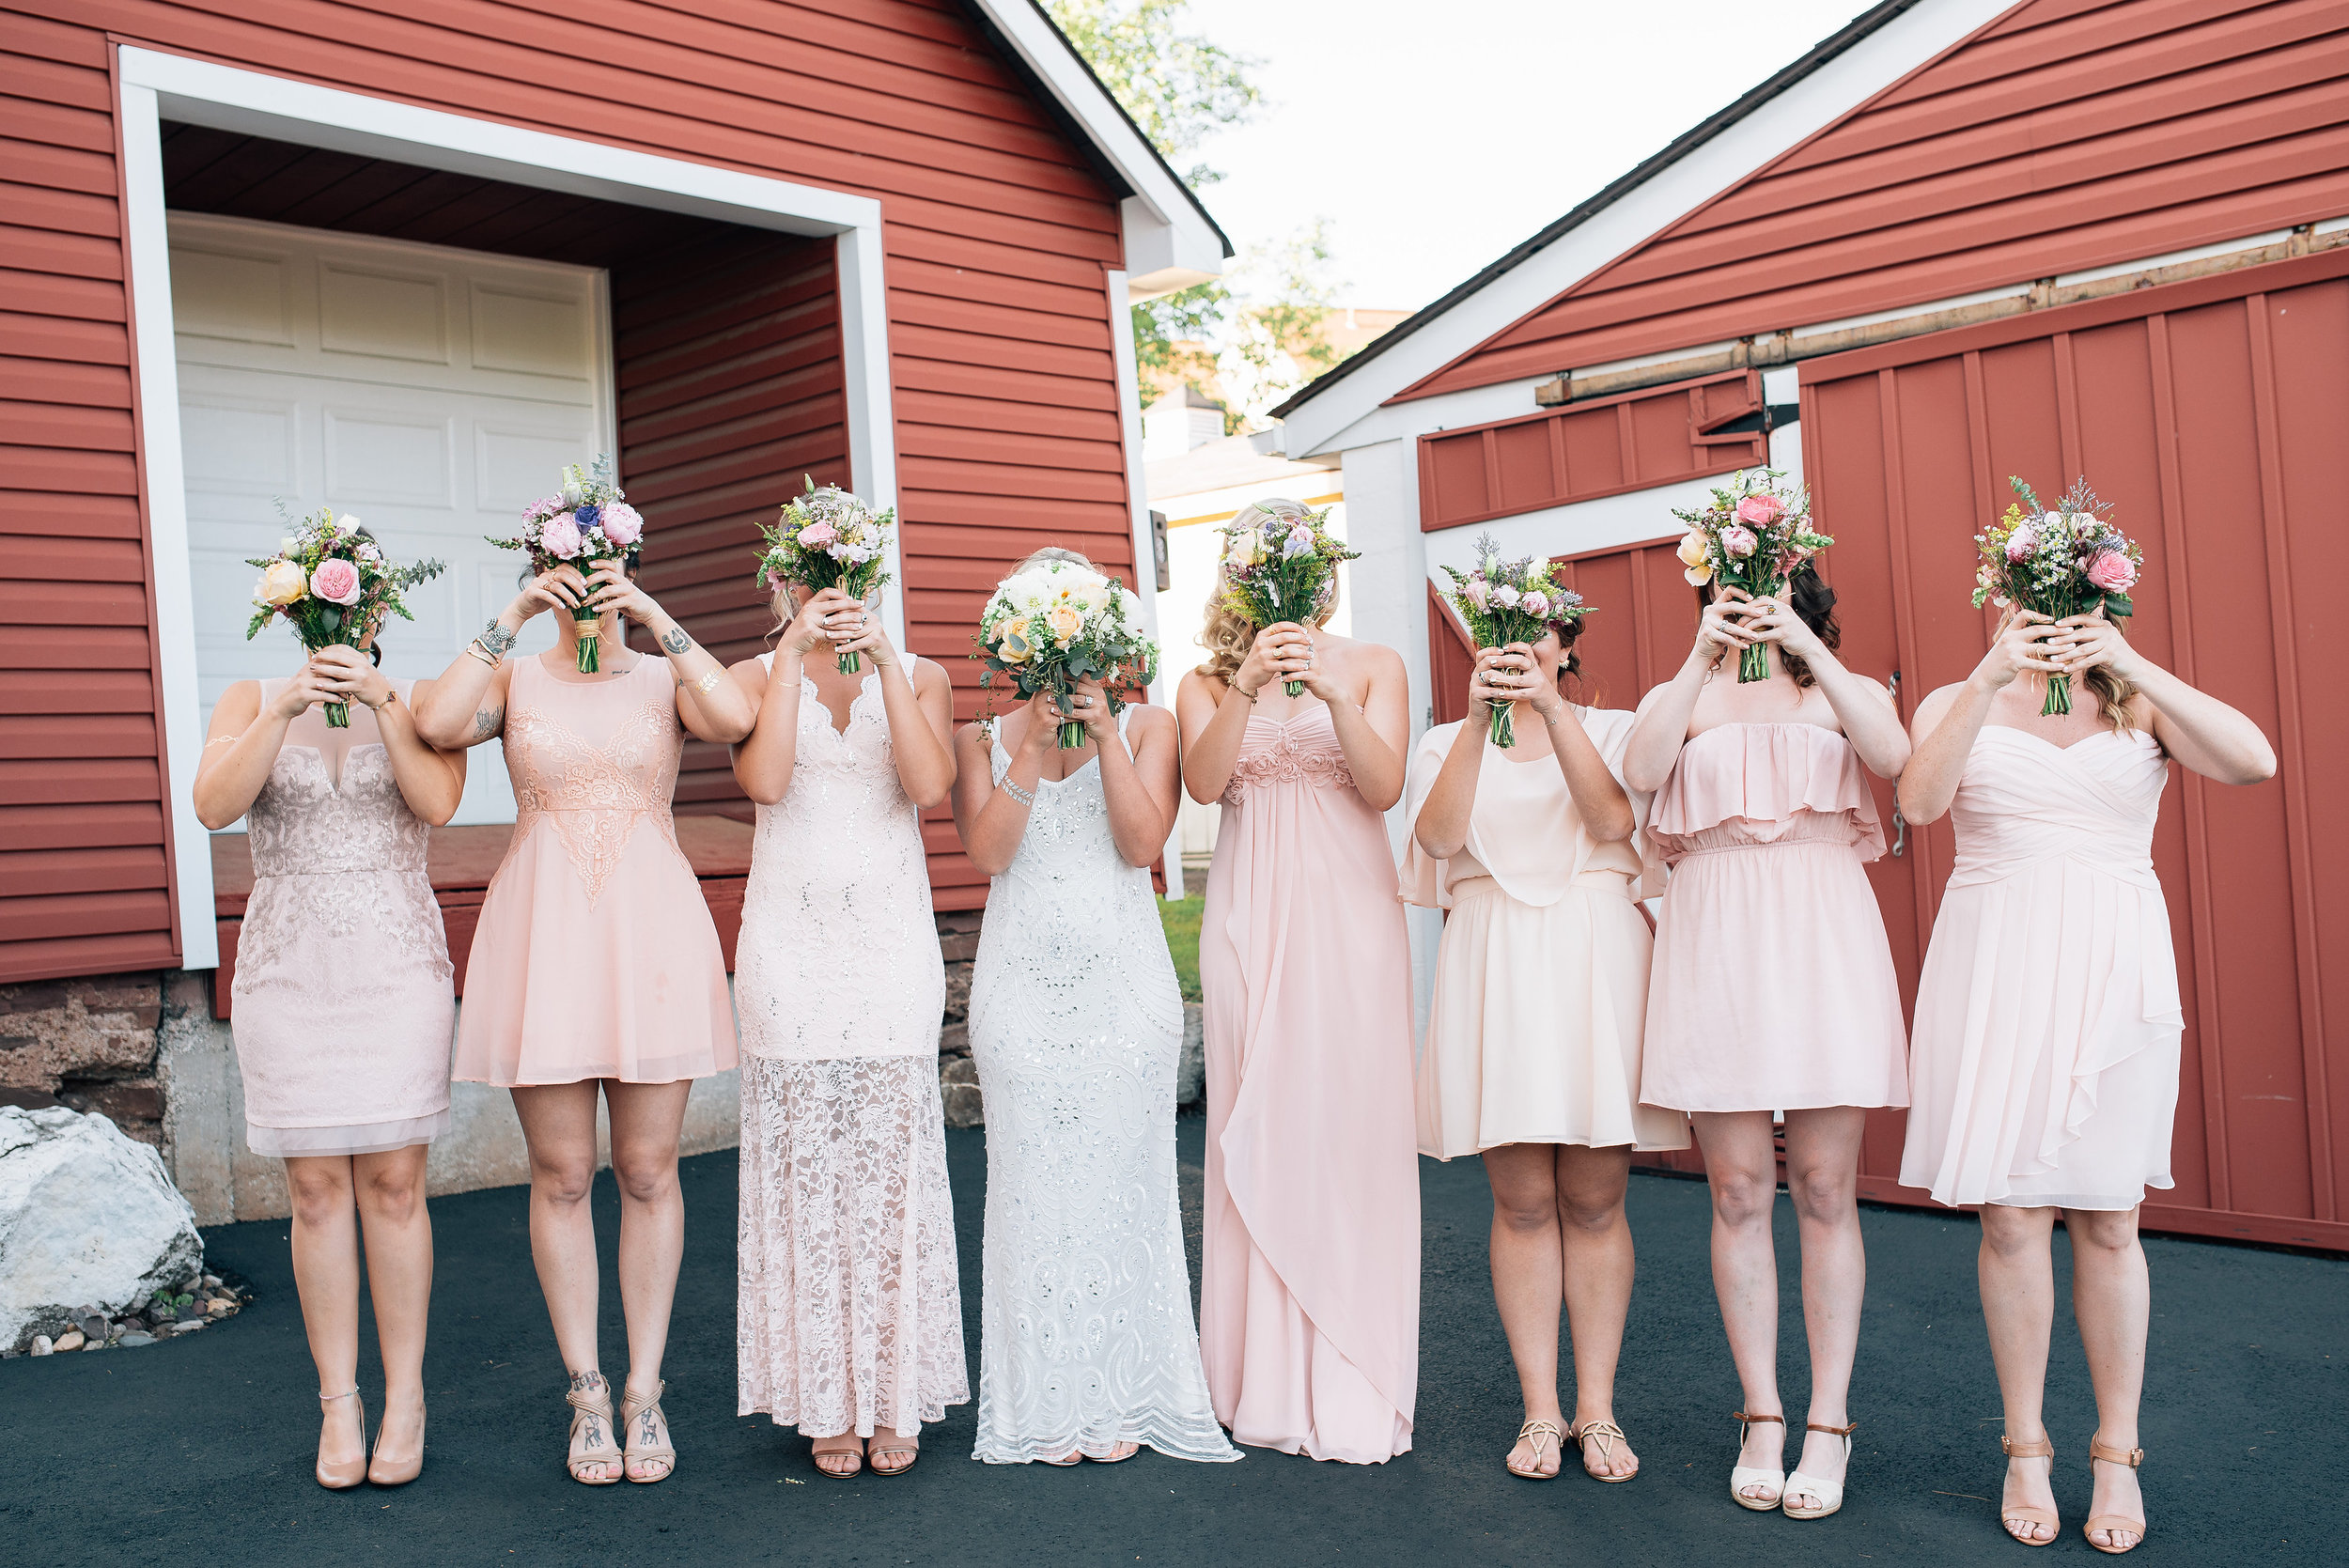 Wedding-LoriPaul-LaurenFletcher-13.jpg